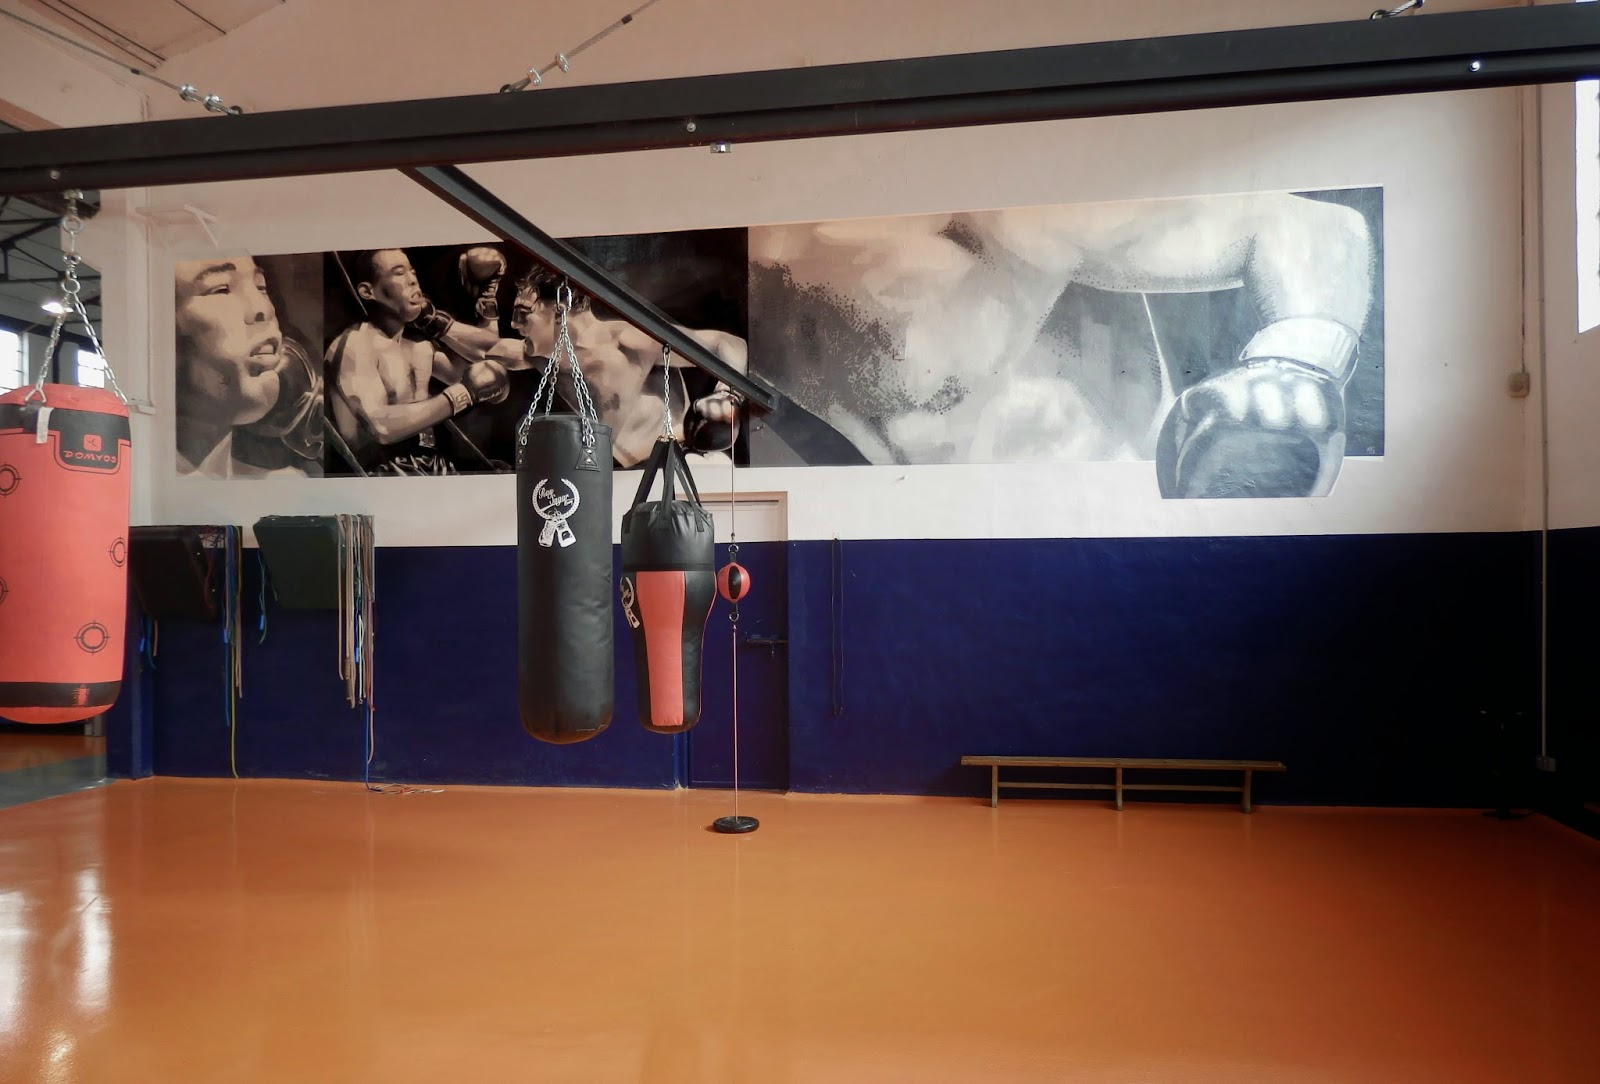 Fill in culture gimnasio gasteiz sport - Decoracion de gimnasios ...